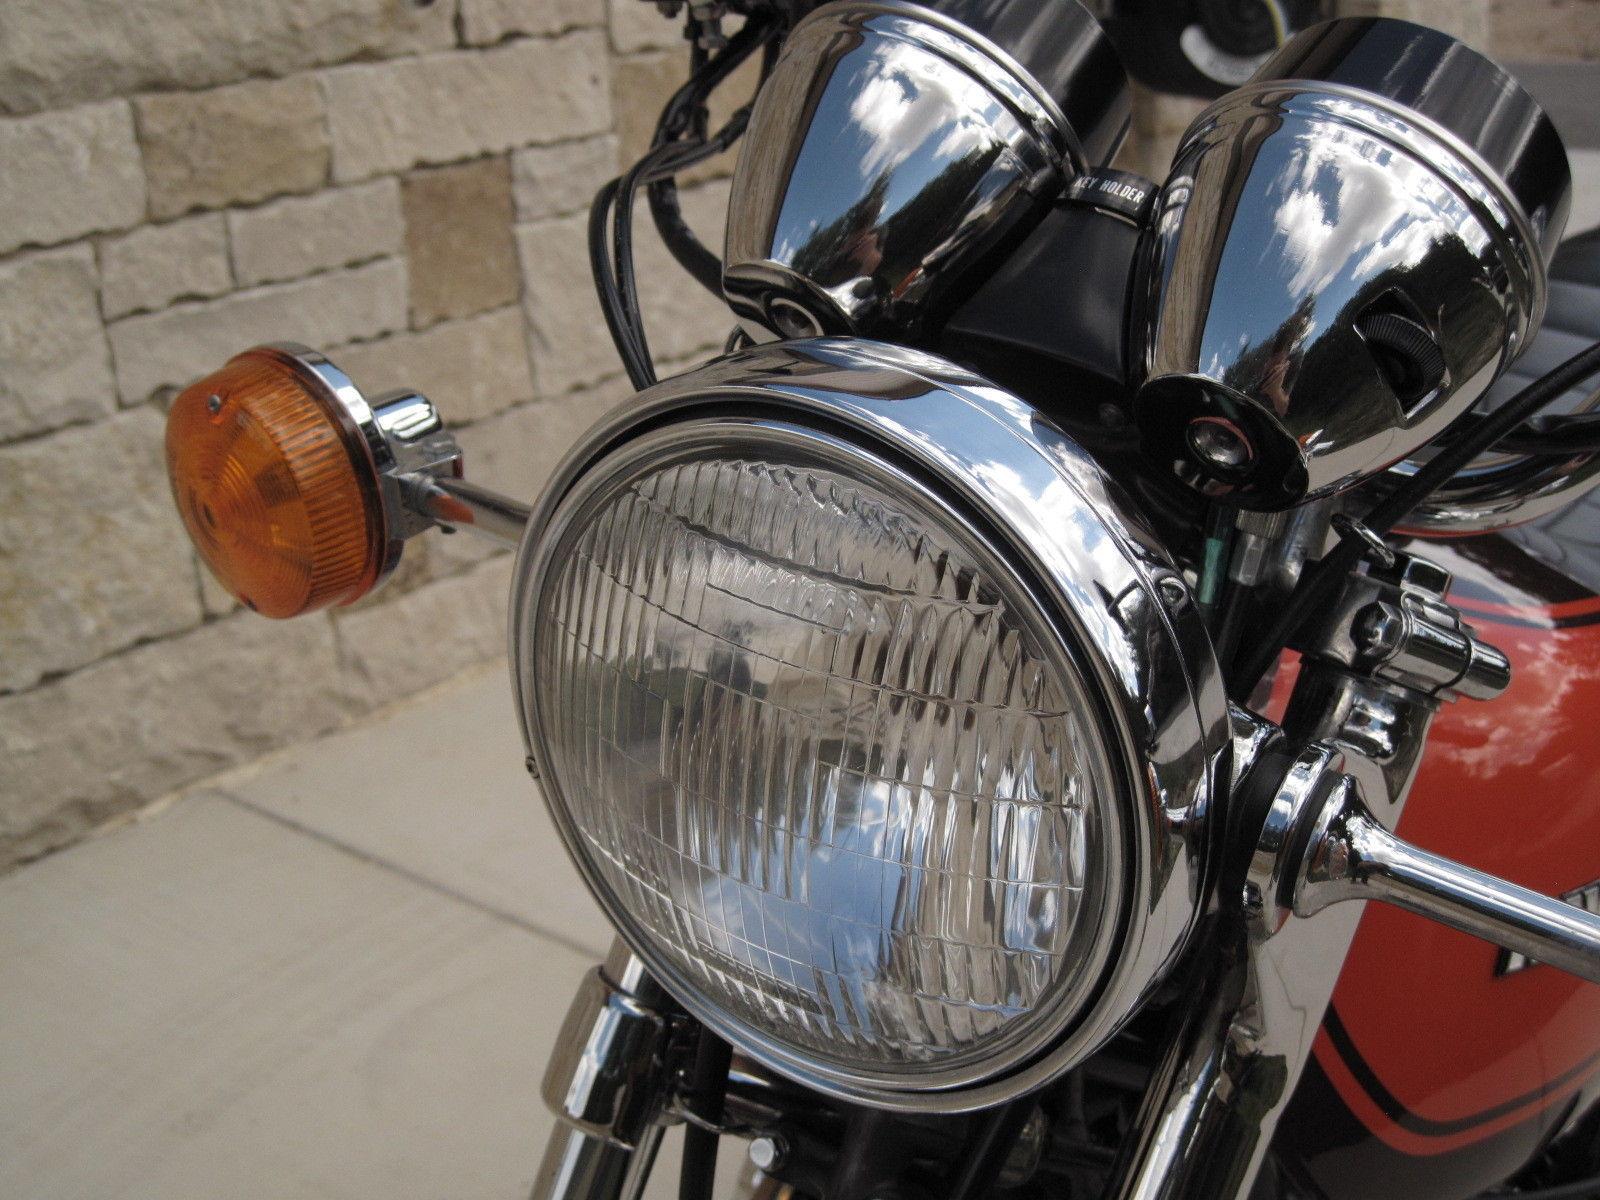 Kawasaki Z1 - 1973 - Headlight, Flasher, Clock Covers and Headlight Ears.